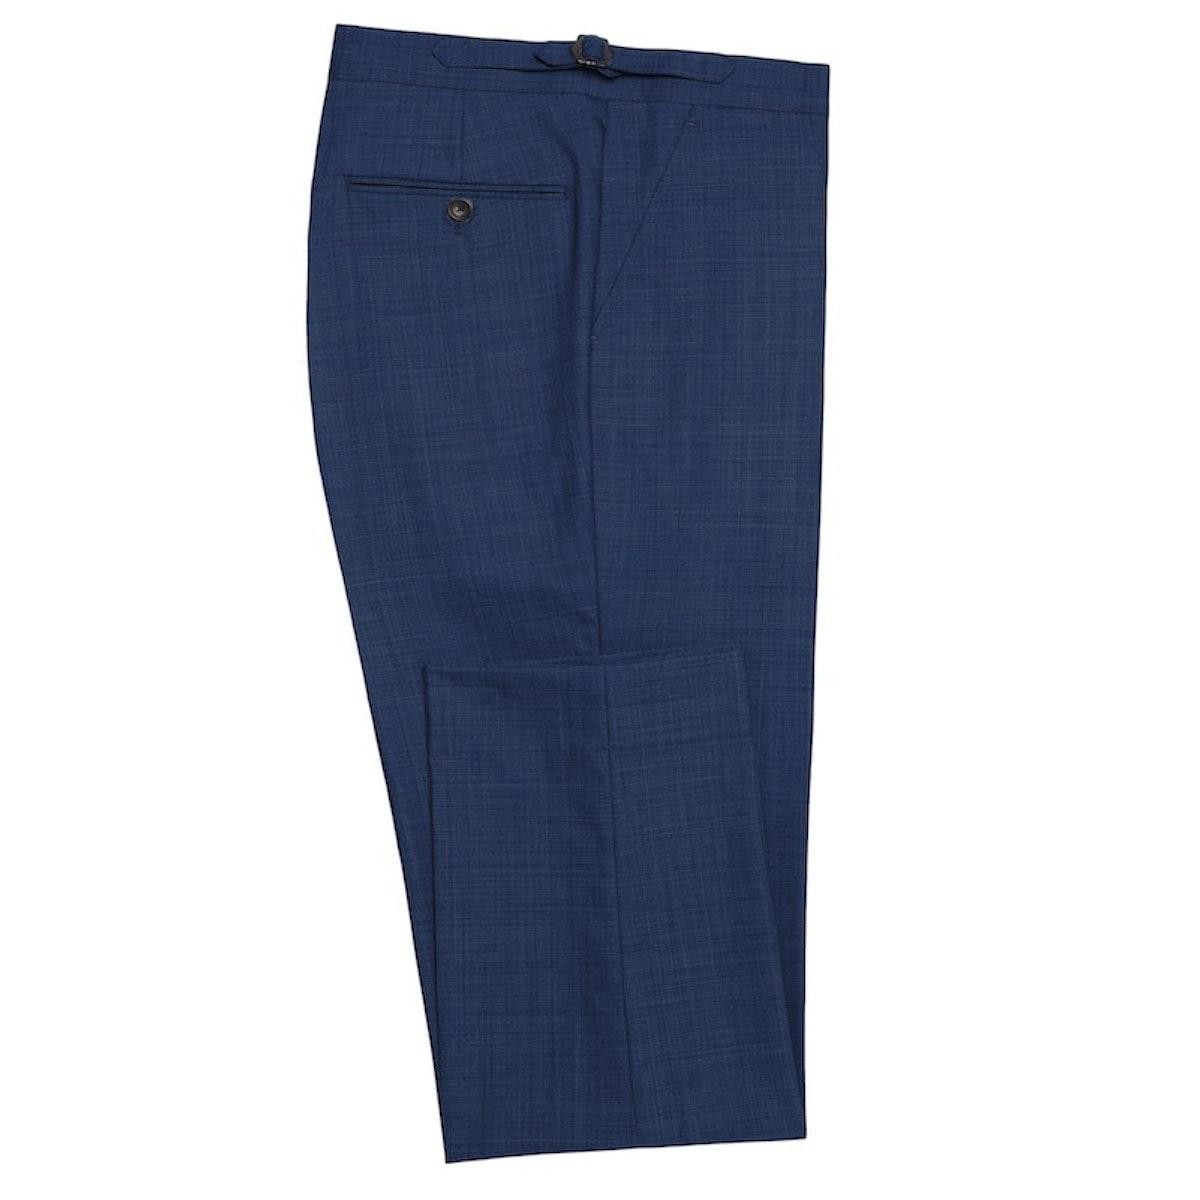 InStitchu Collection Bushelman Blue Wool Pants